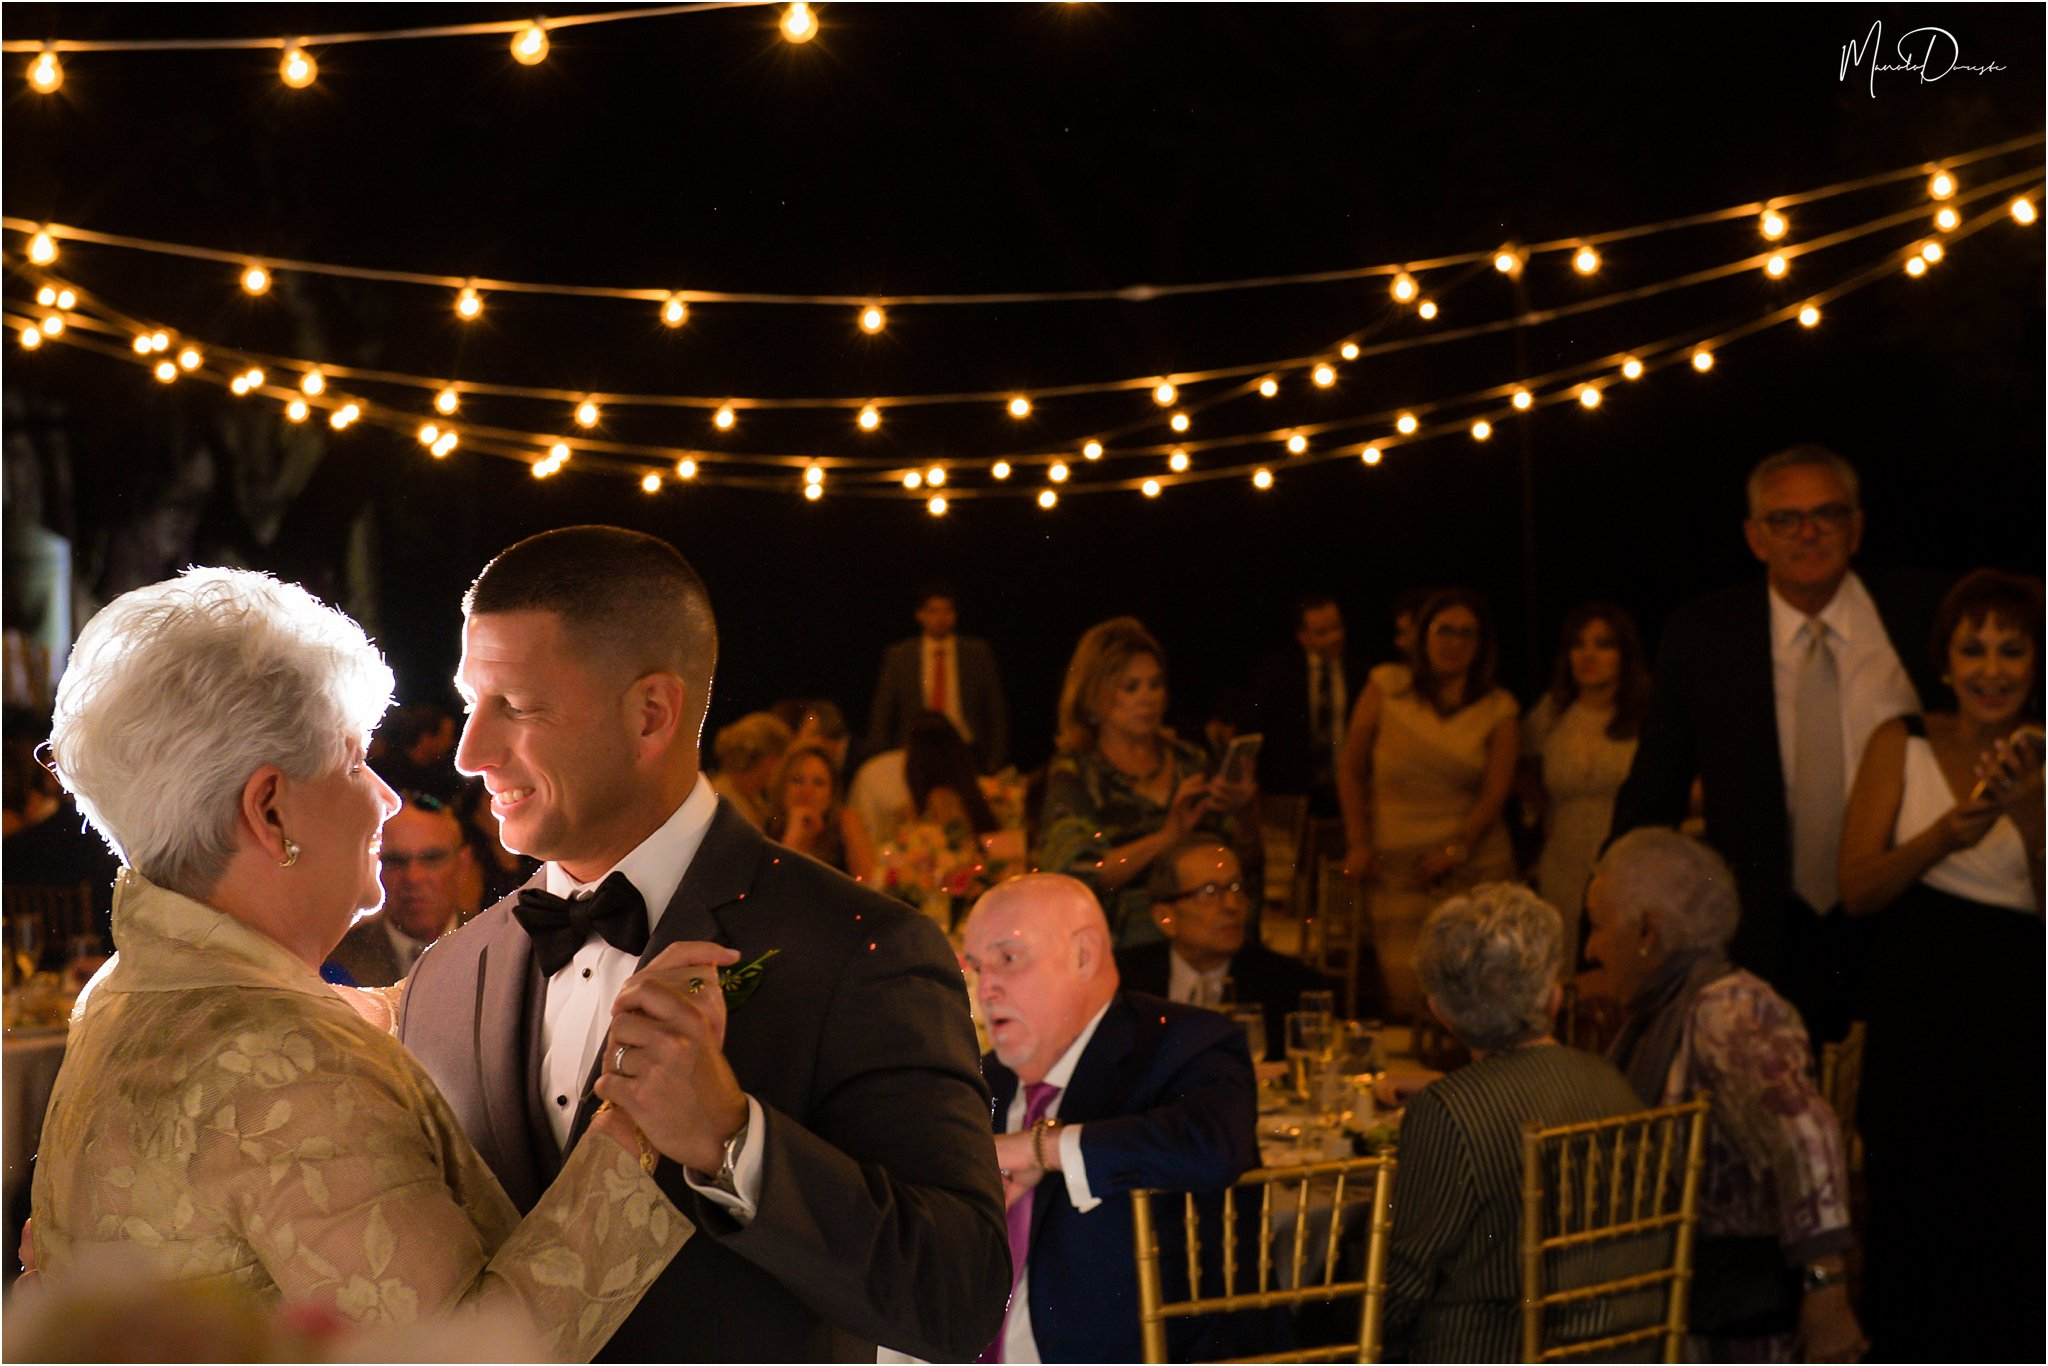 00848_ManoloDoreste_InFocusStudios_Wedding_Family_Photography_Miami_MiamiPhotographer.jpg